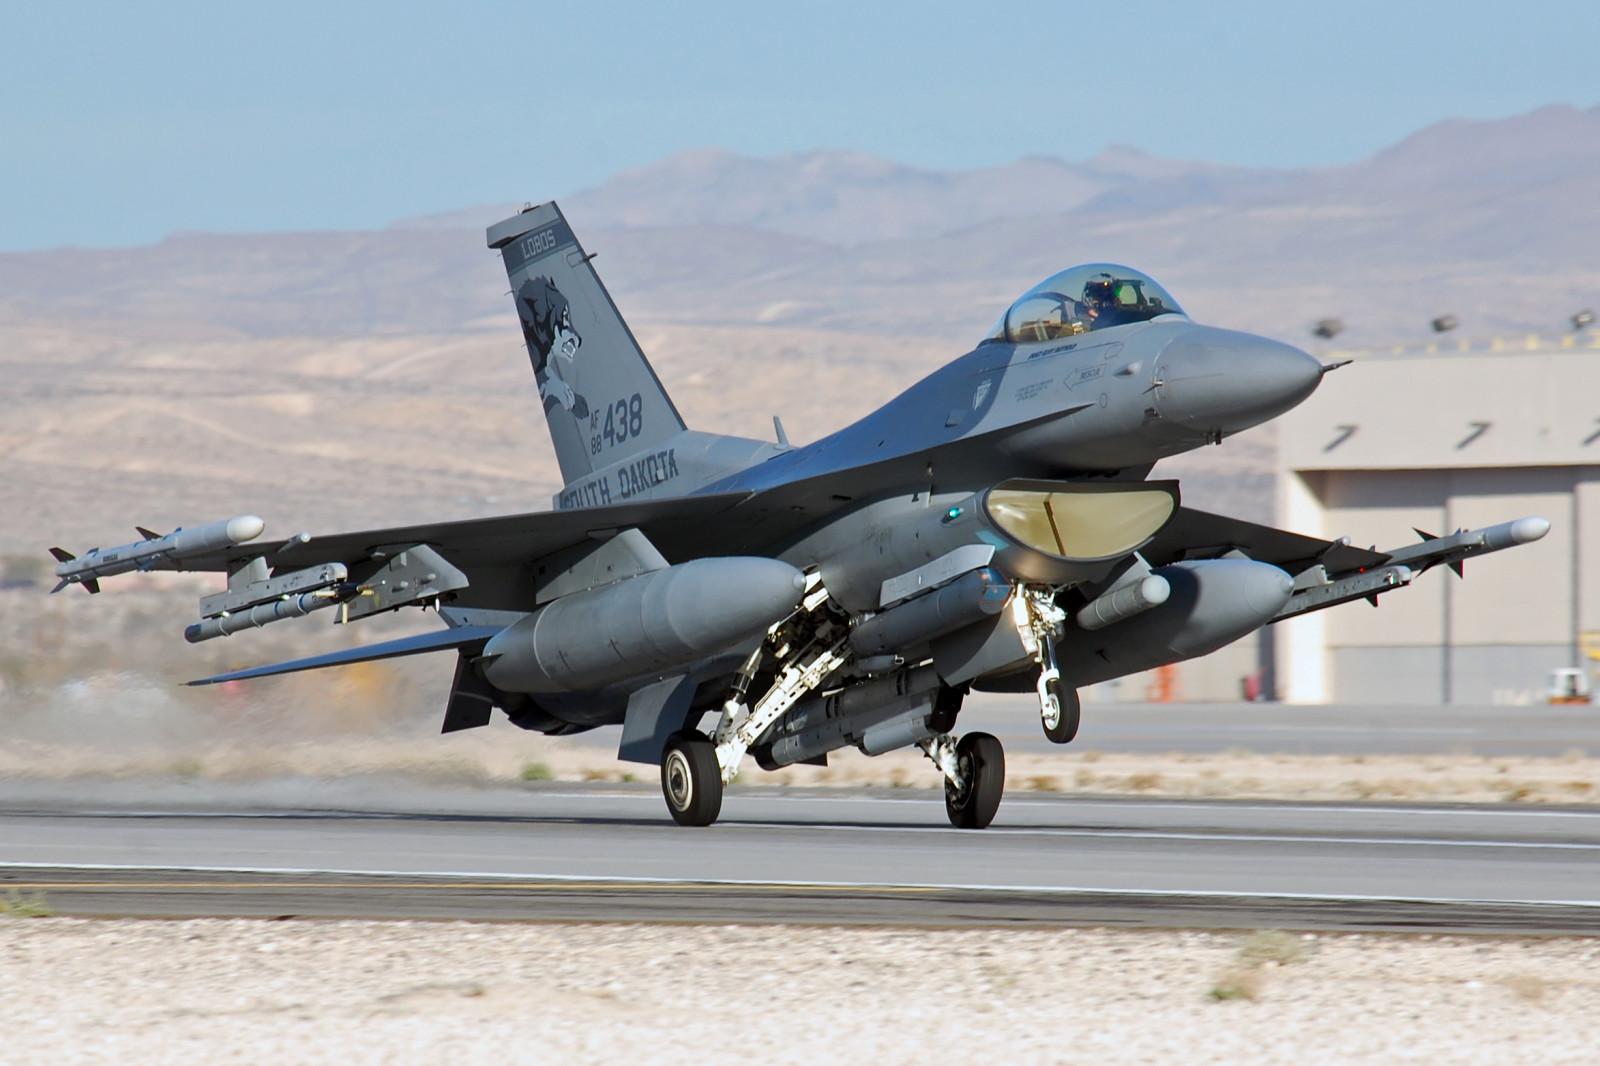 Aereo Da Combattimento Cinese : Sfondi aereo aerei militari aeronautica militare